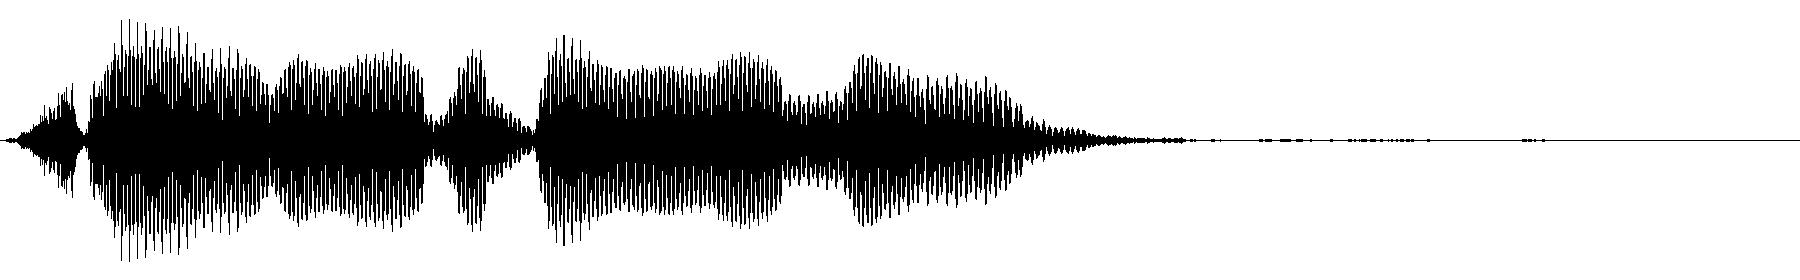 alvinbary 14